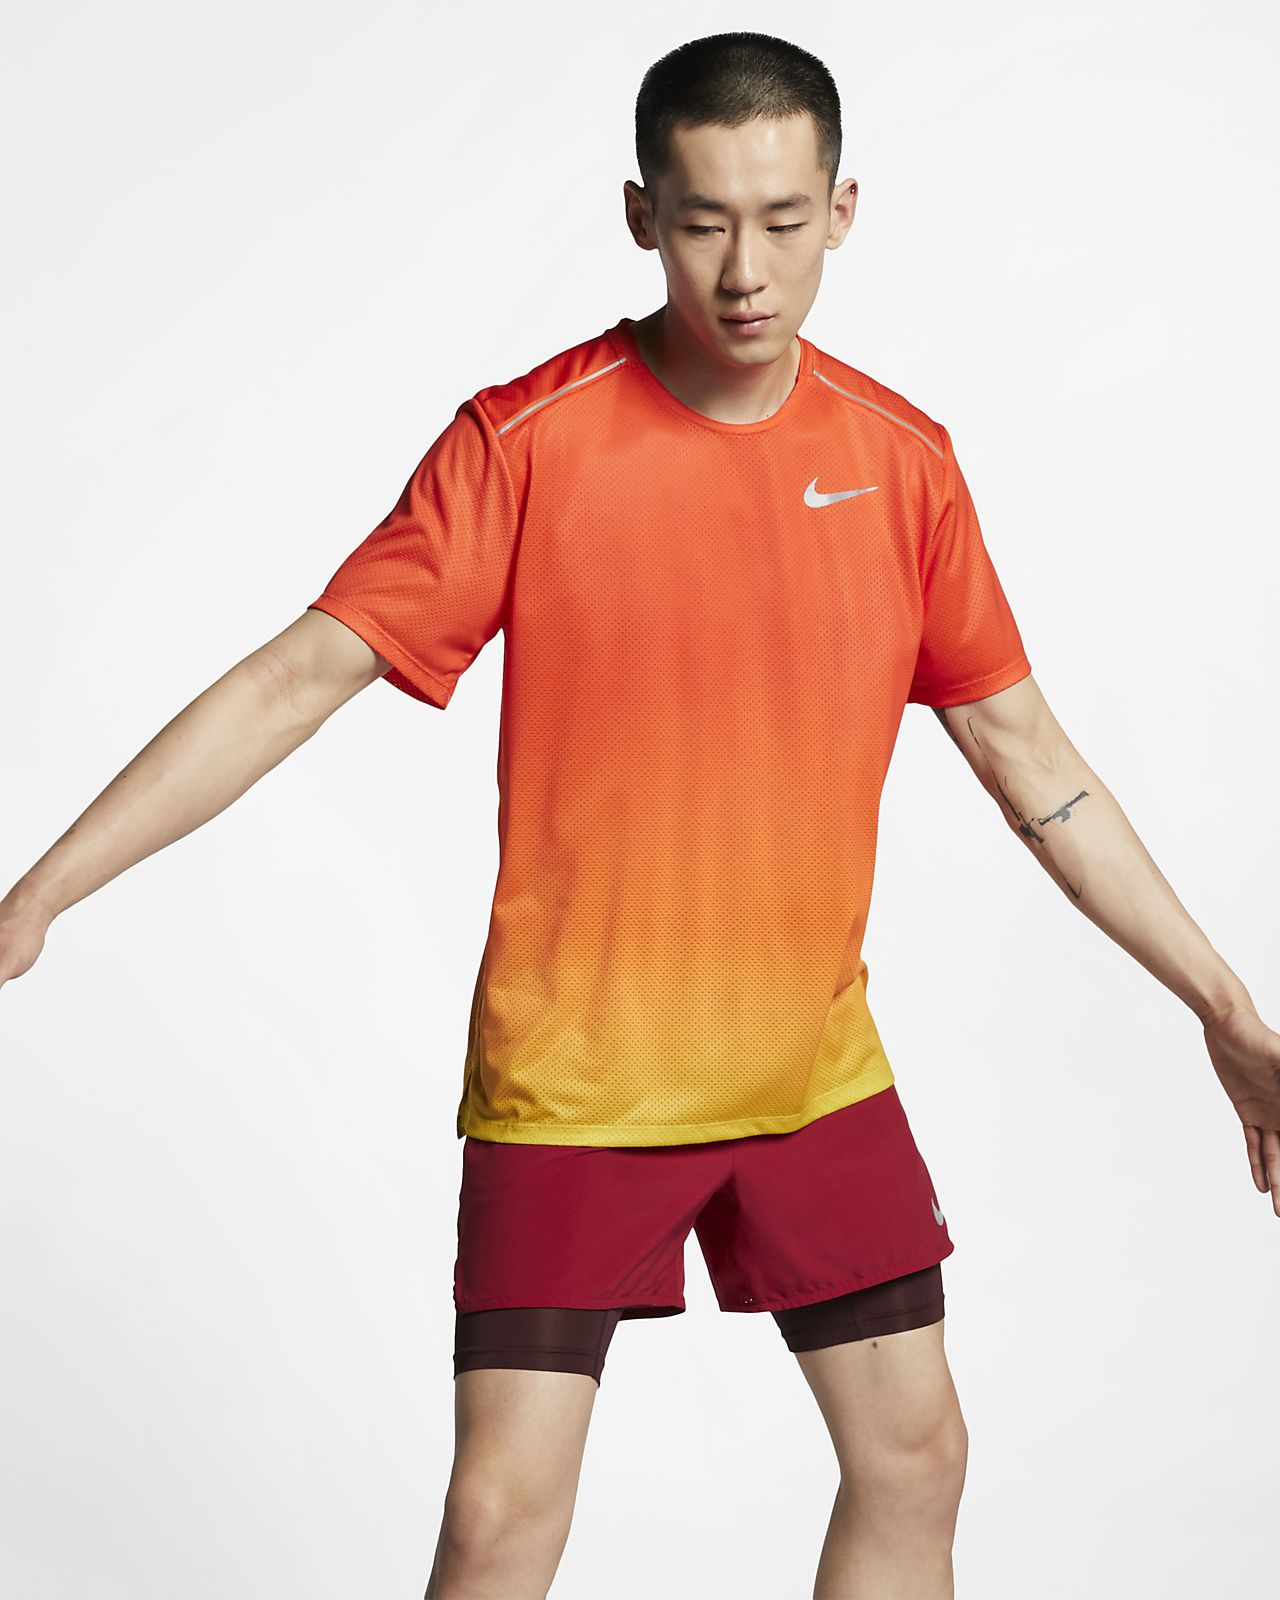 Nike Dri-FIT Miler Men's Short-Sleeve Printed Running Top